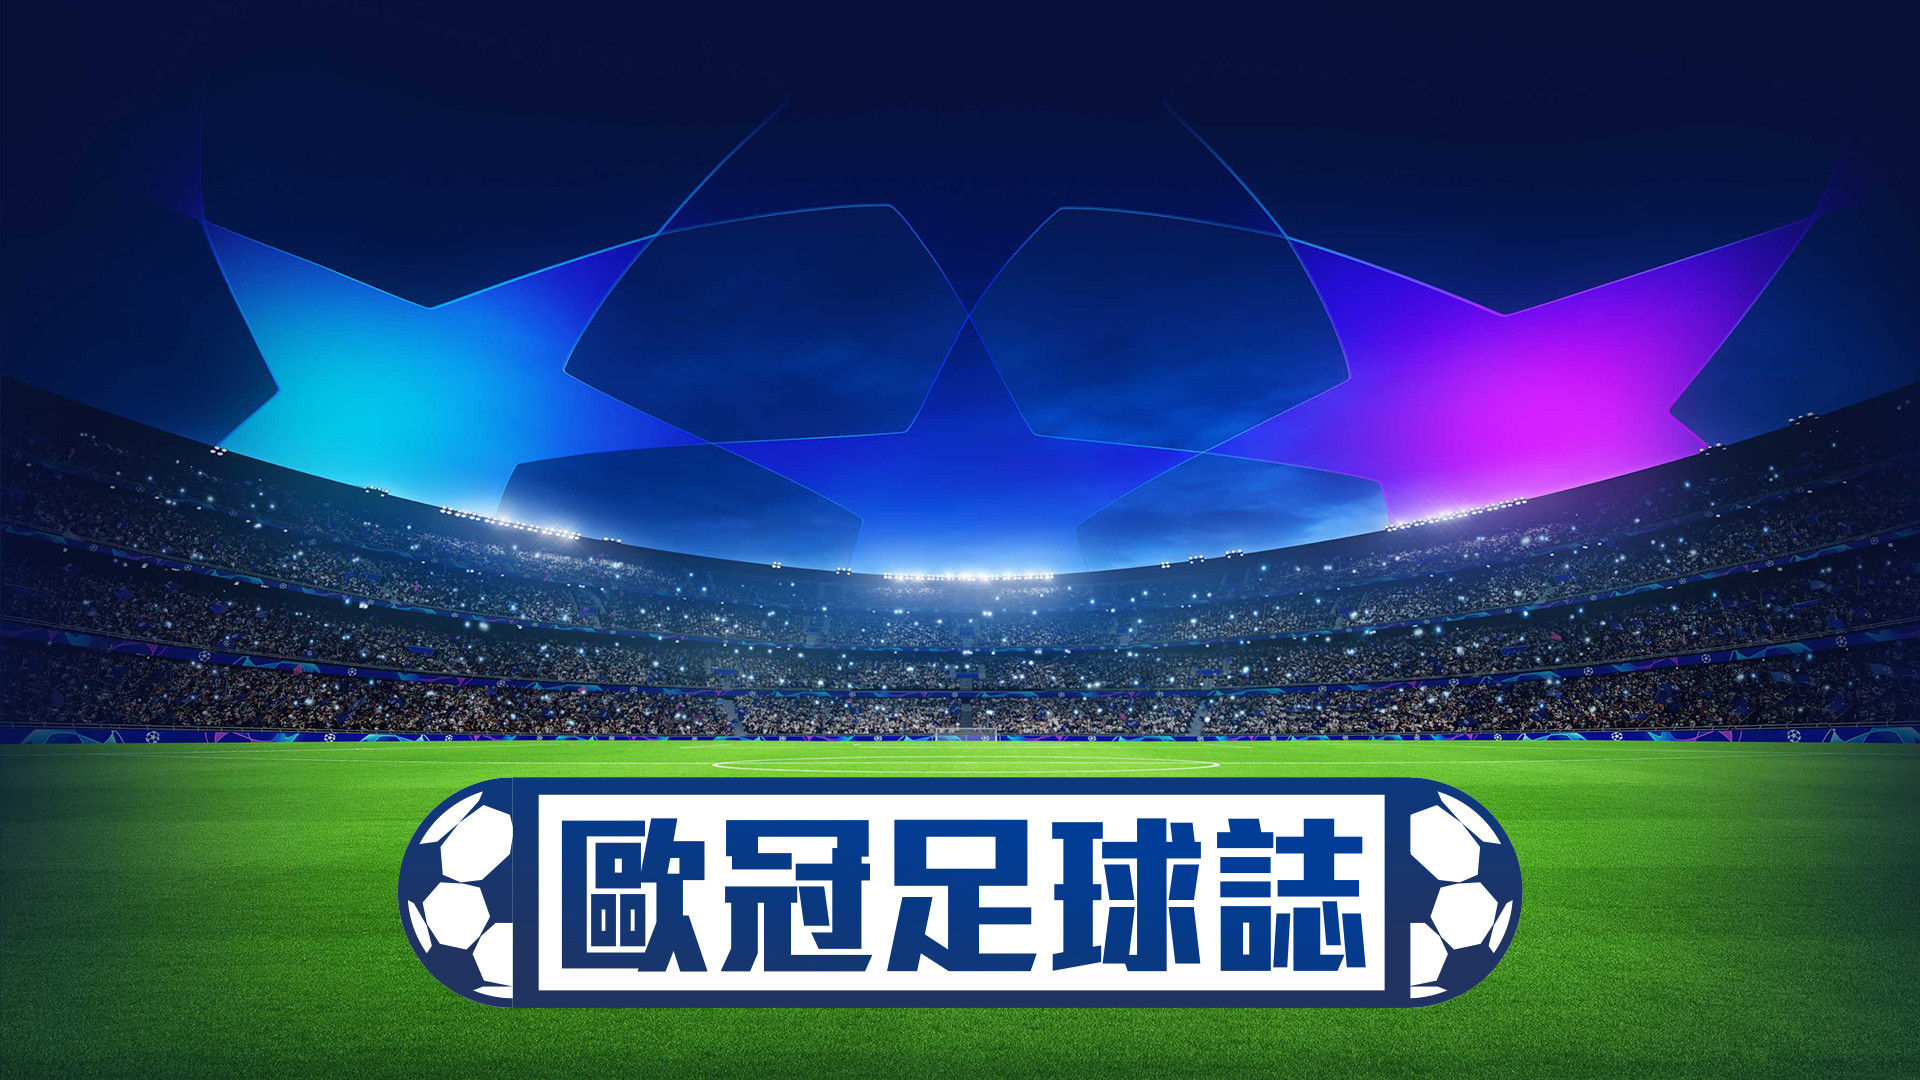 歐冠足球誌 第3集